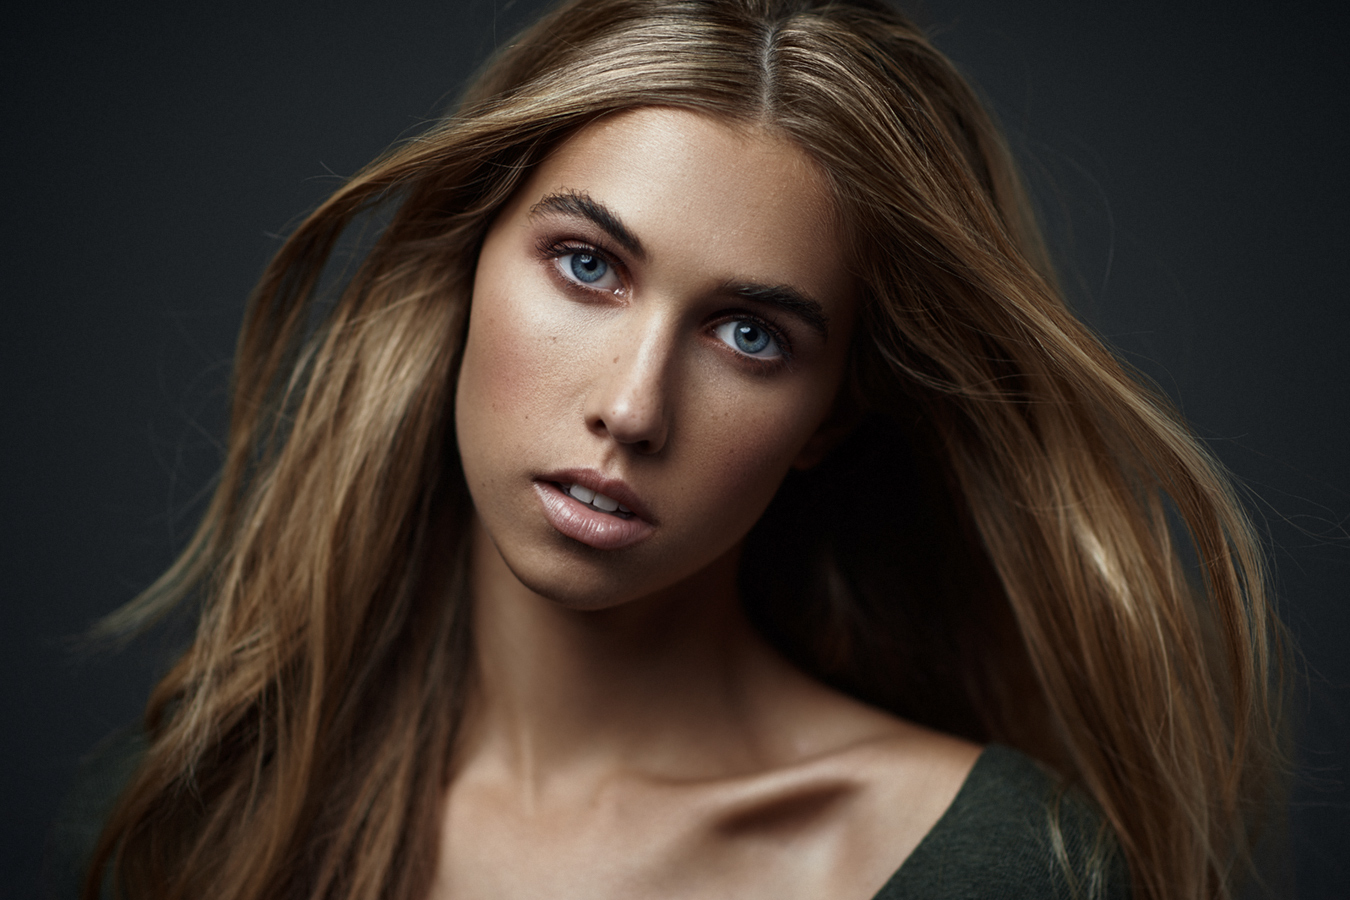 Portrait And Headshot Photography Portfolio